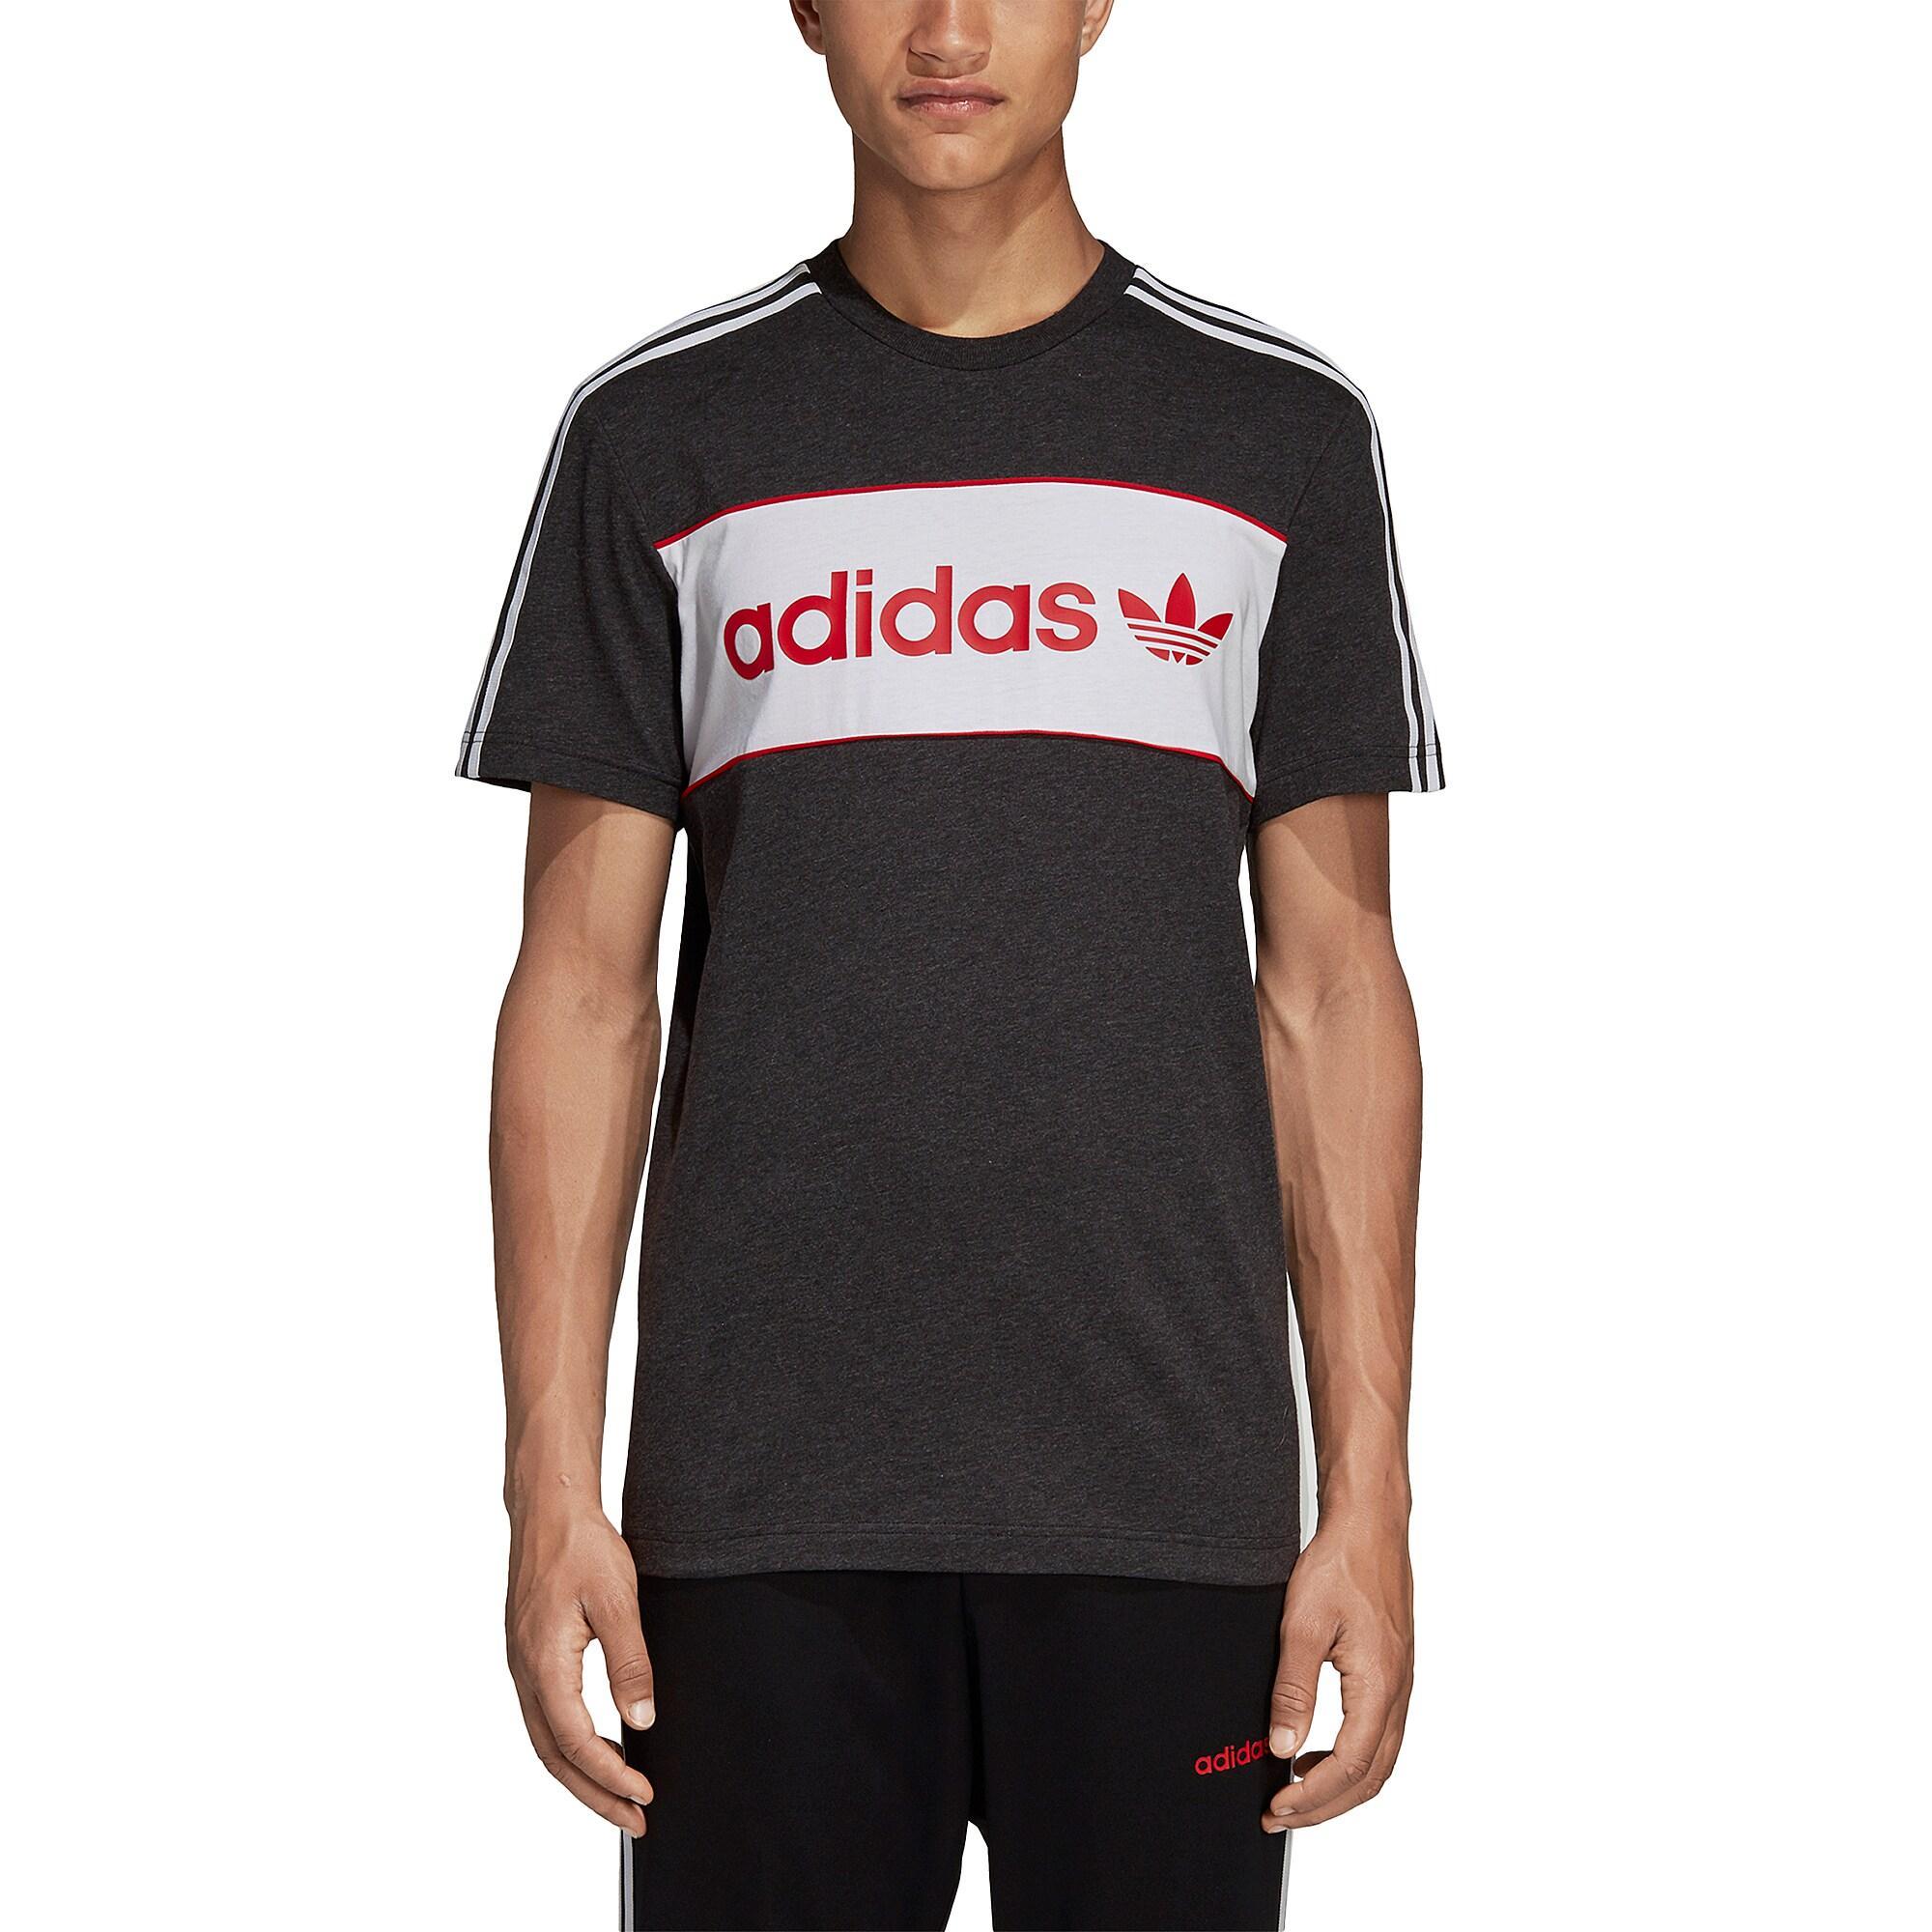 05c3b121 adidas Originals Linear T-shirt in Black for Men - Lyst